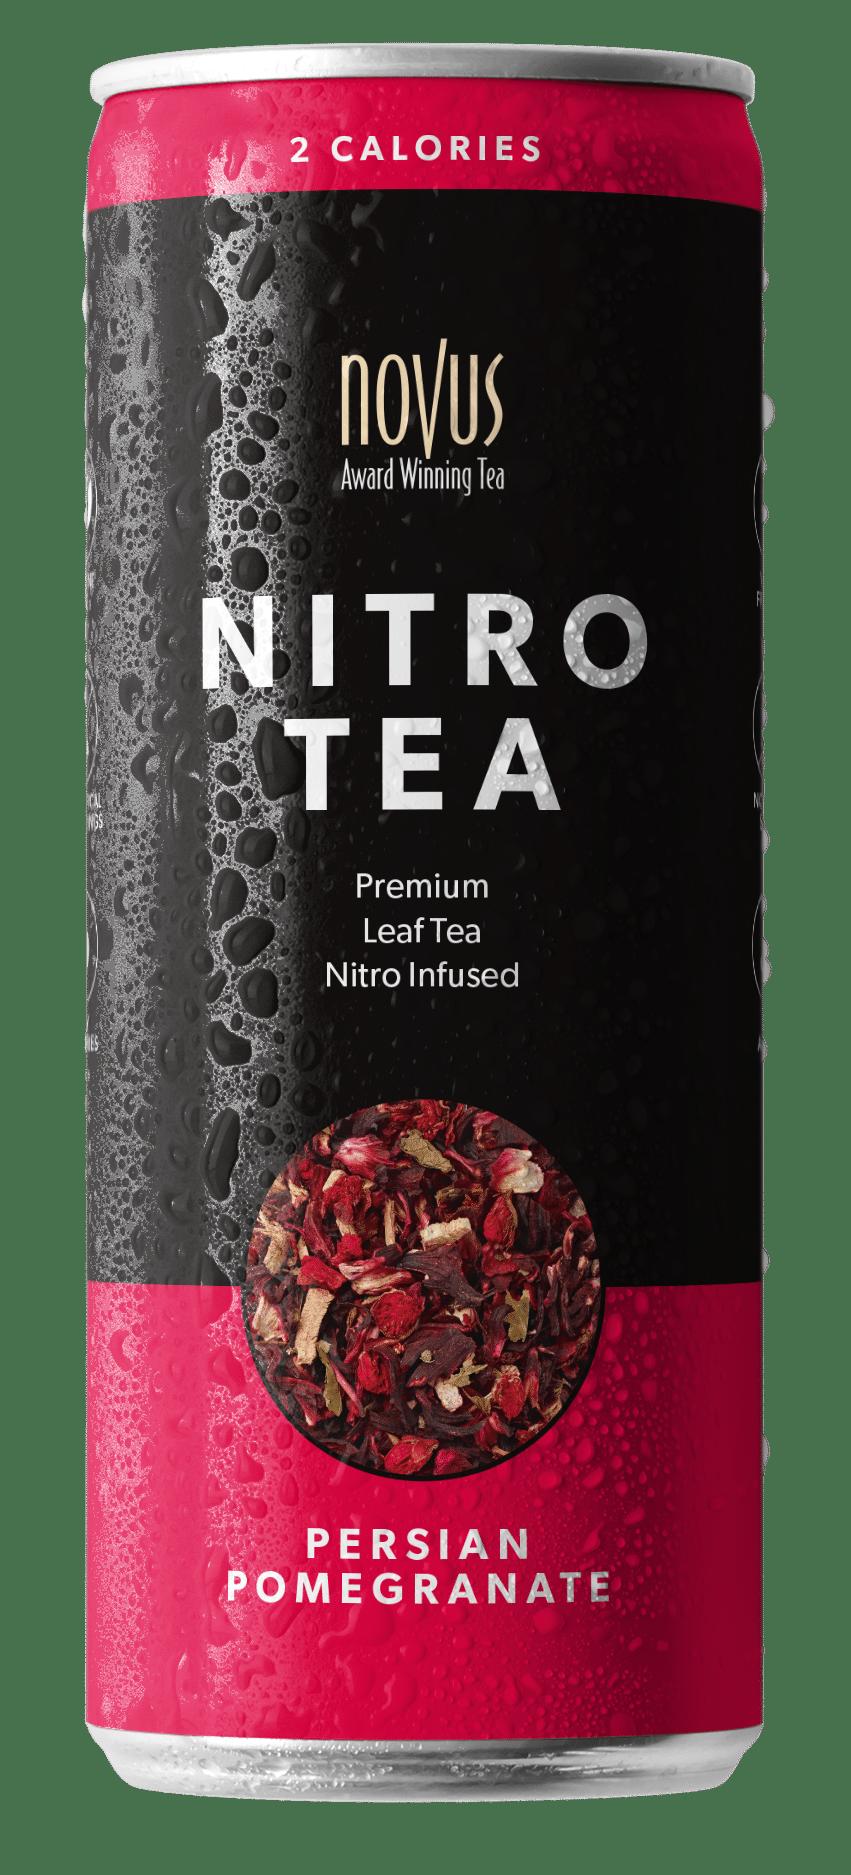 New Nitro Can